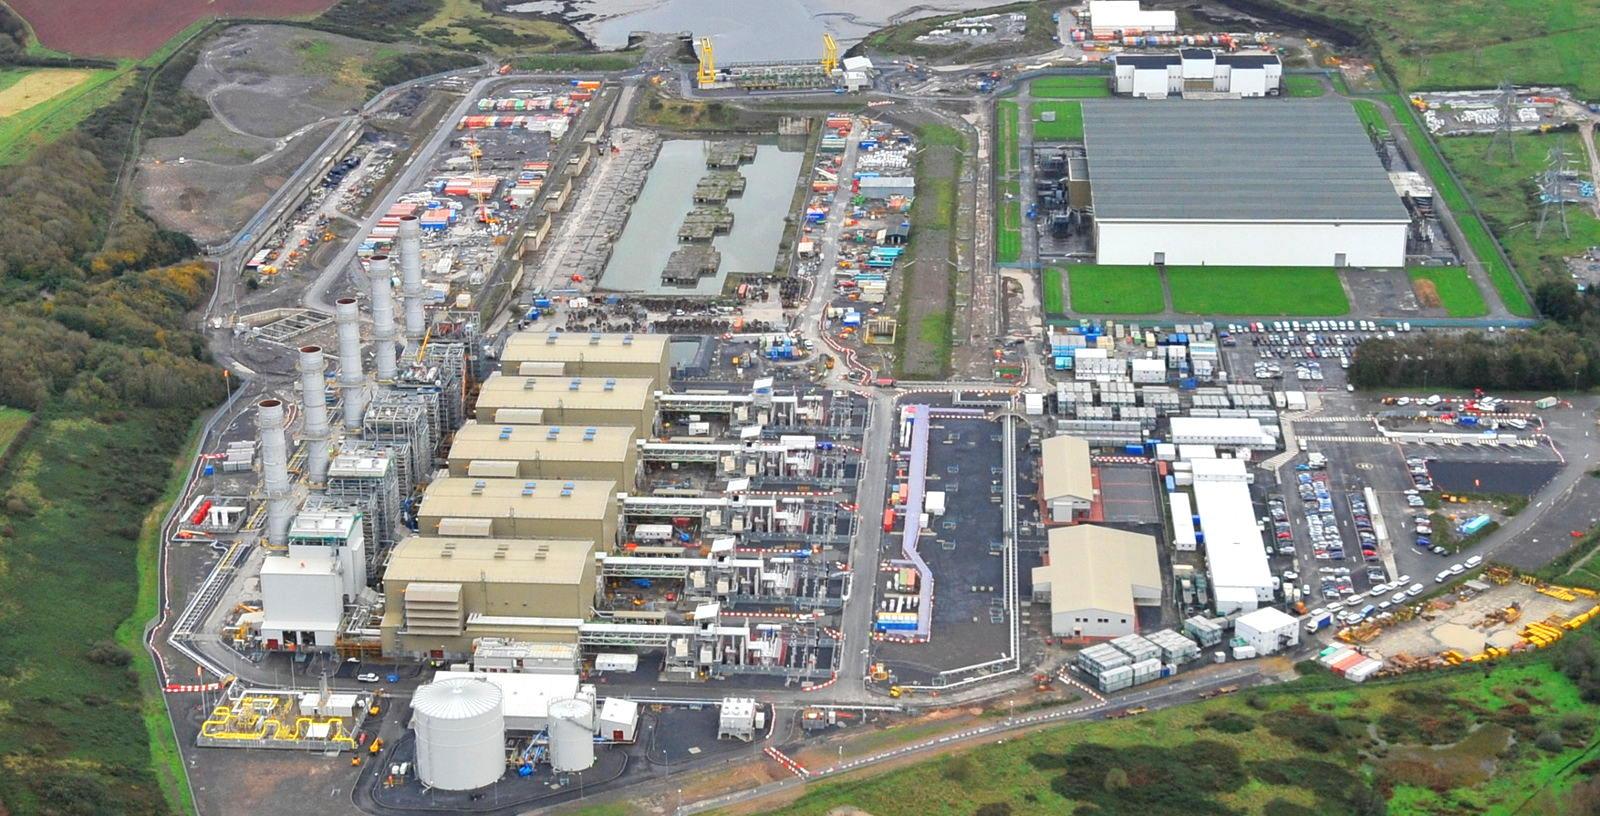 Alstom. Pembroke Power Station. 27.10.11